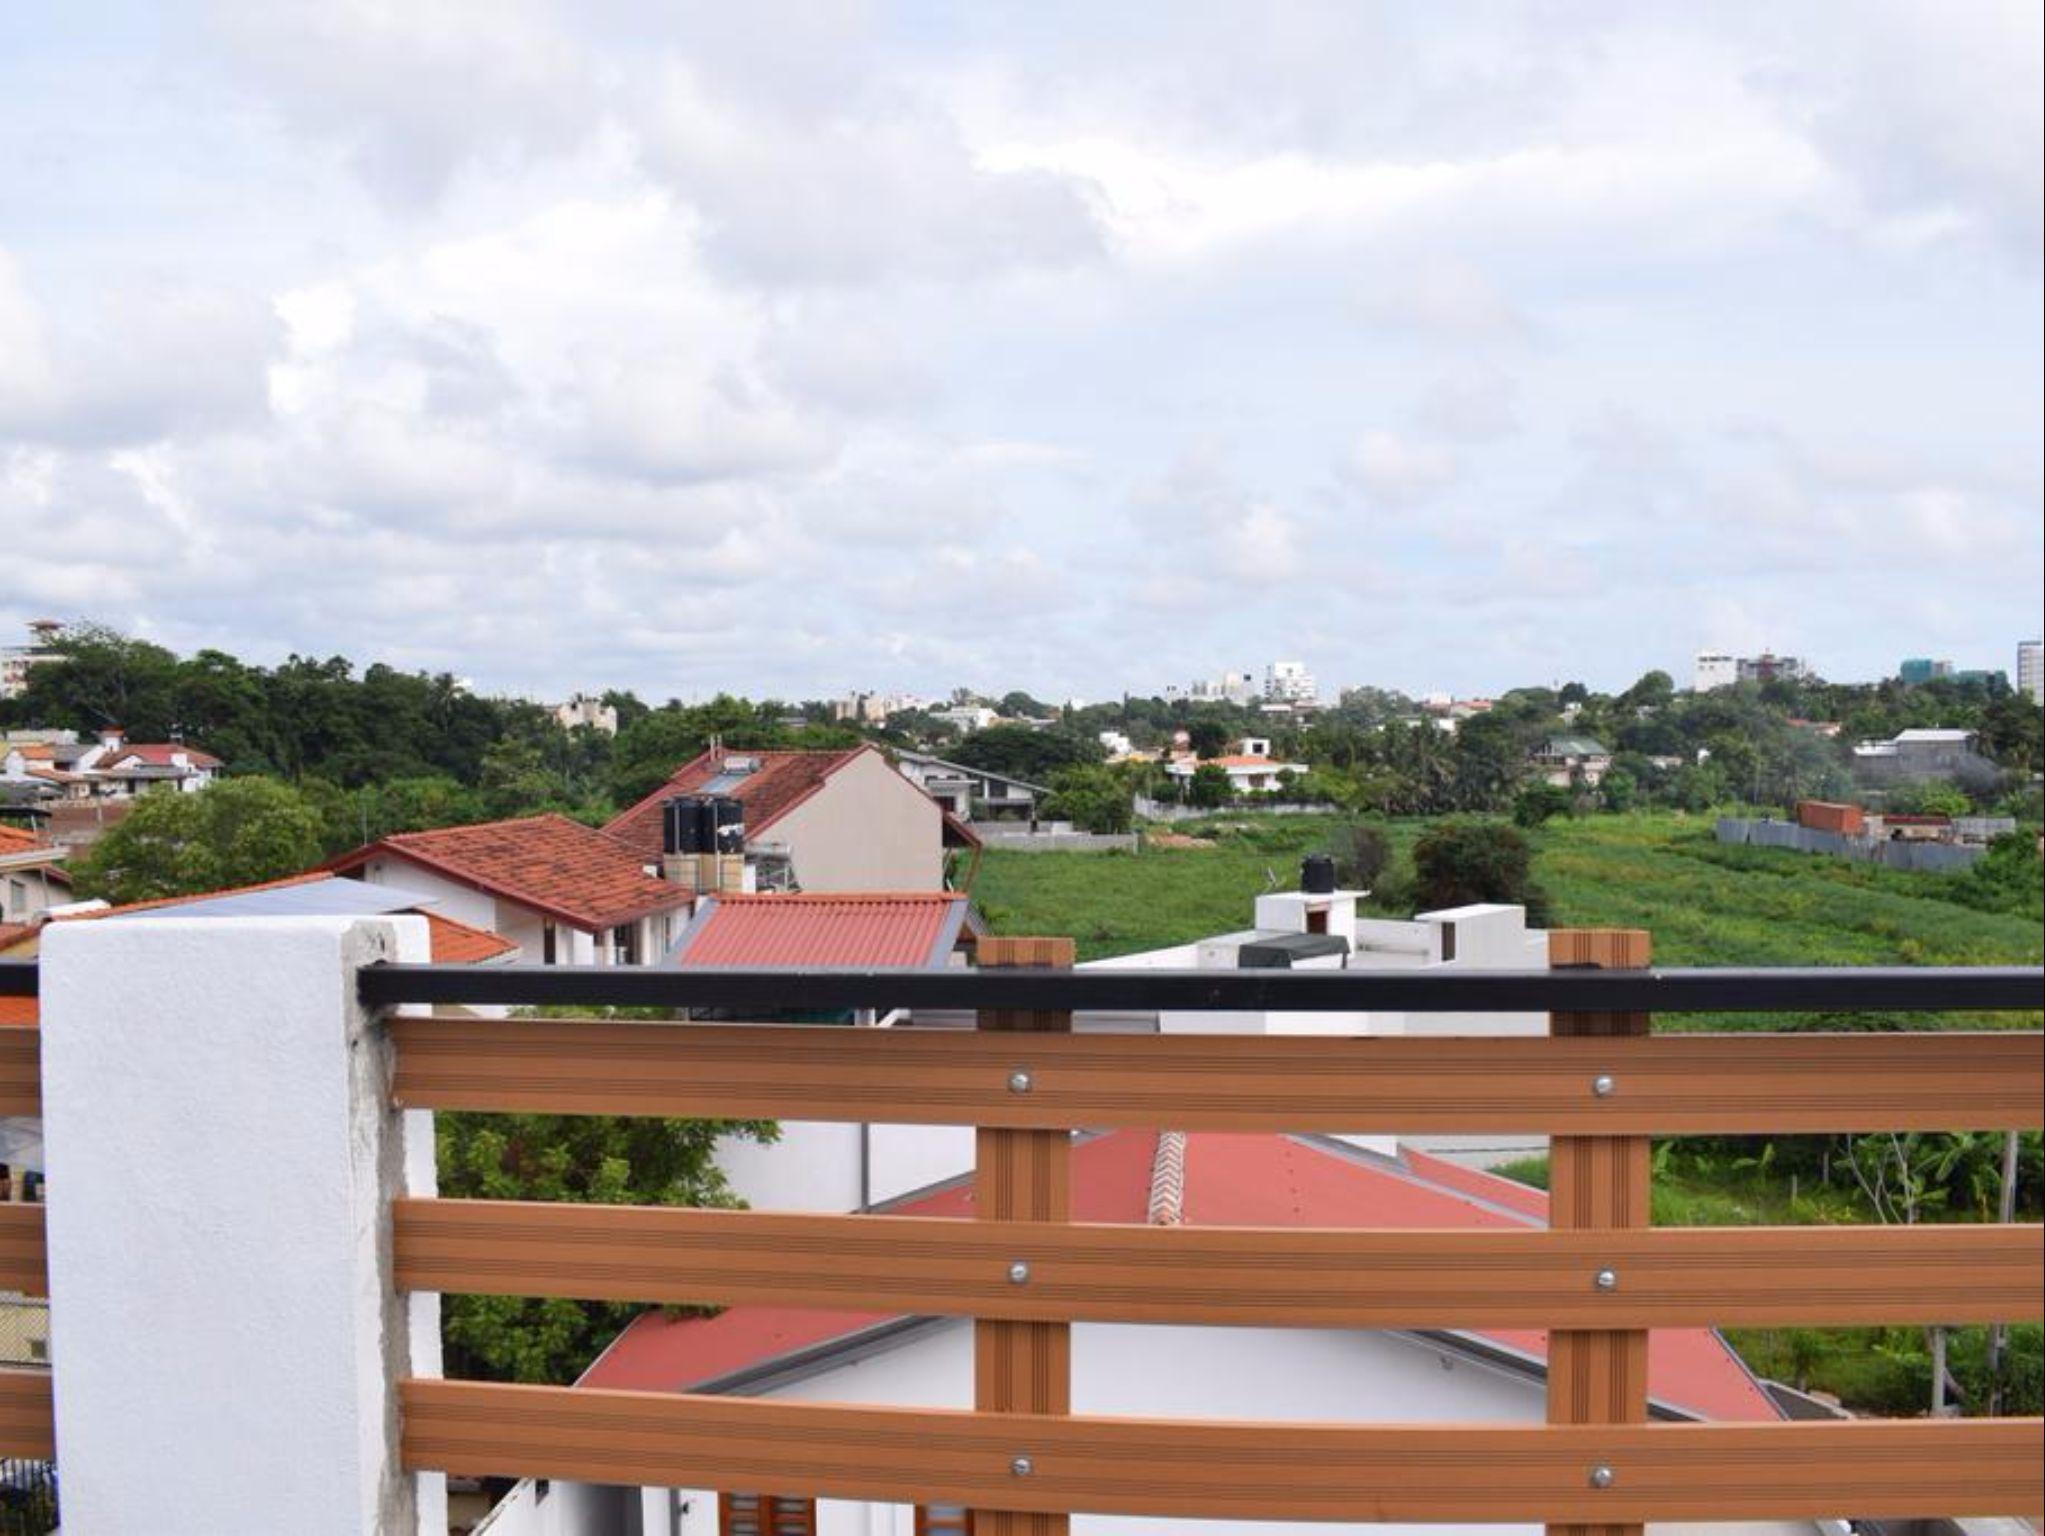 Yoho Kurunduwatta Road, Sri Jayawardanapura Kotte